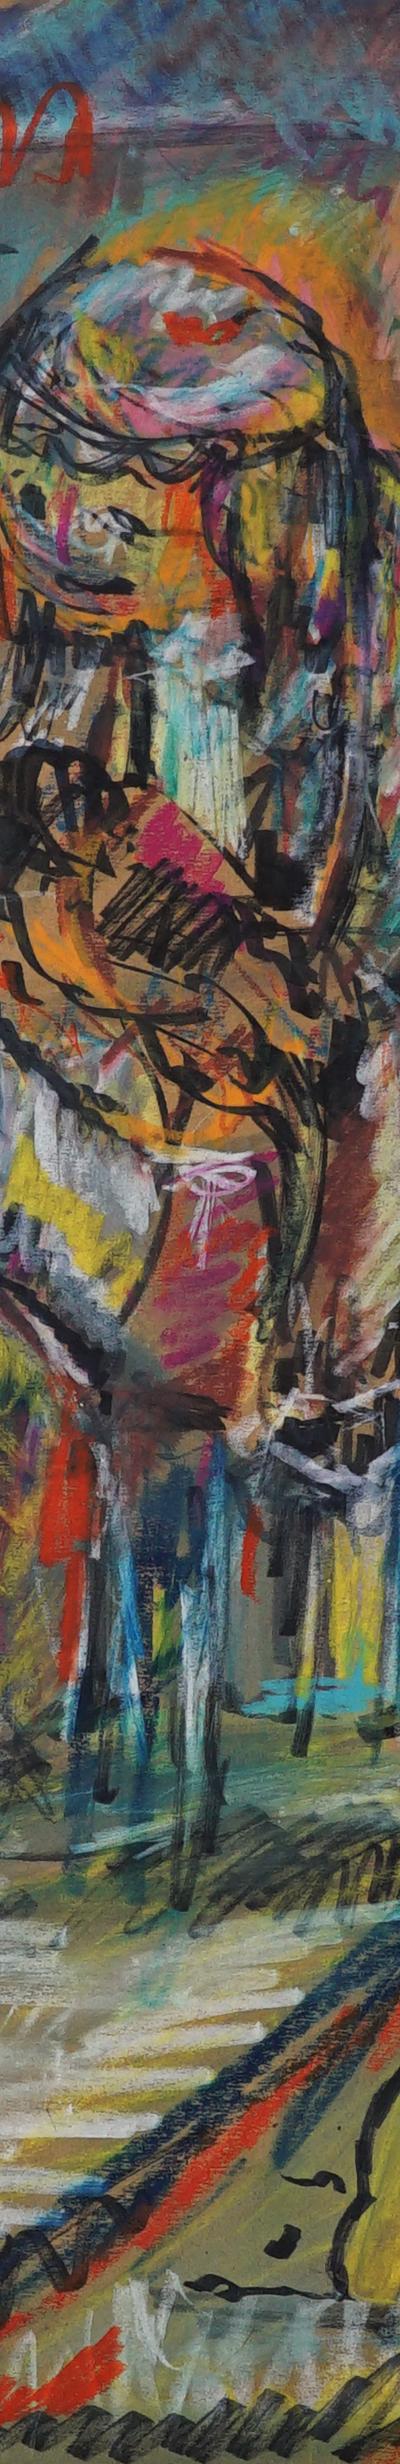 study 68x92 cm, pastel